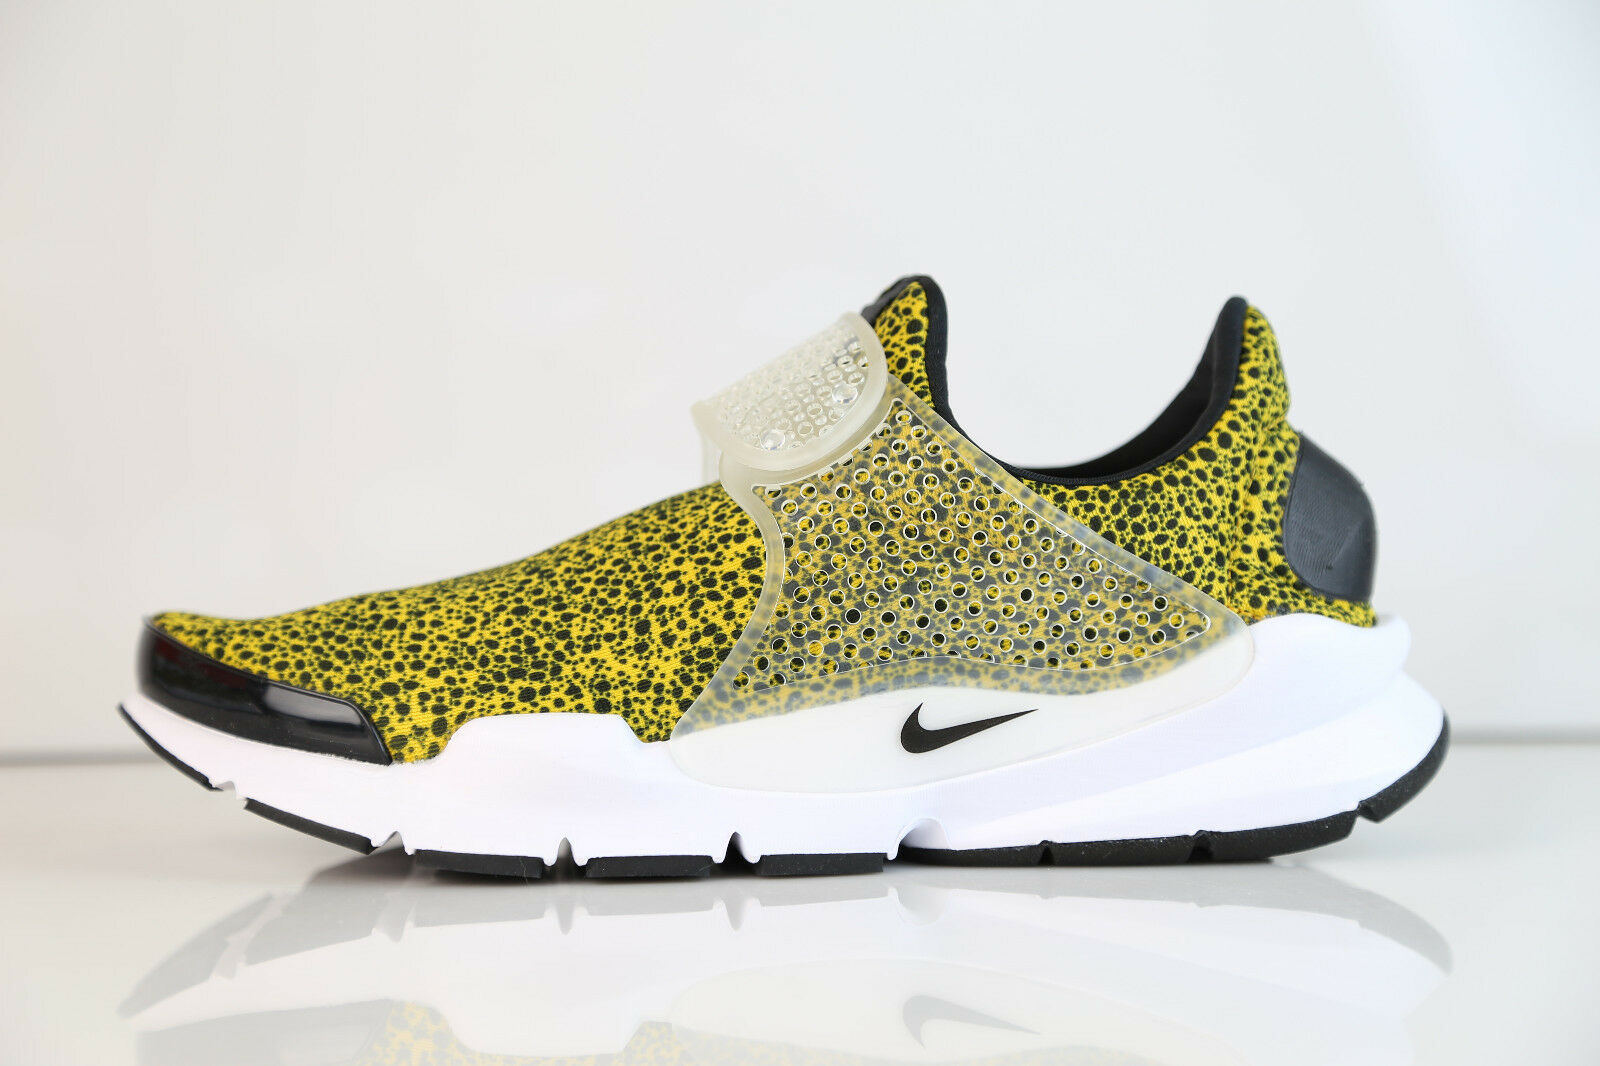 Nike Sock Dart QS Safari University Gold Black 942198-700 8-12 air free Great discount